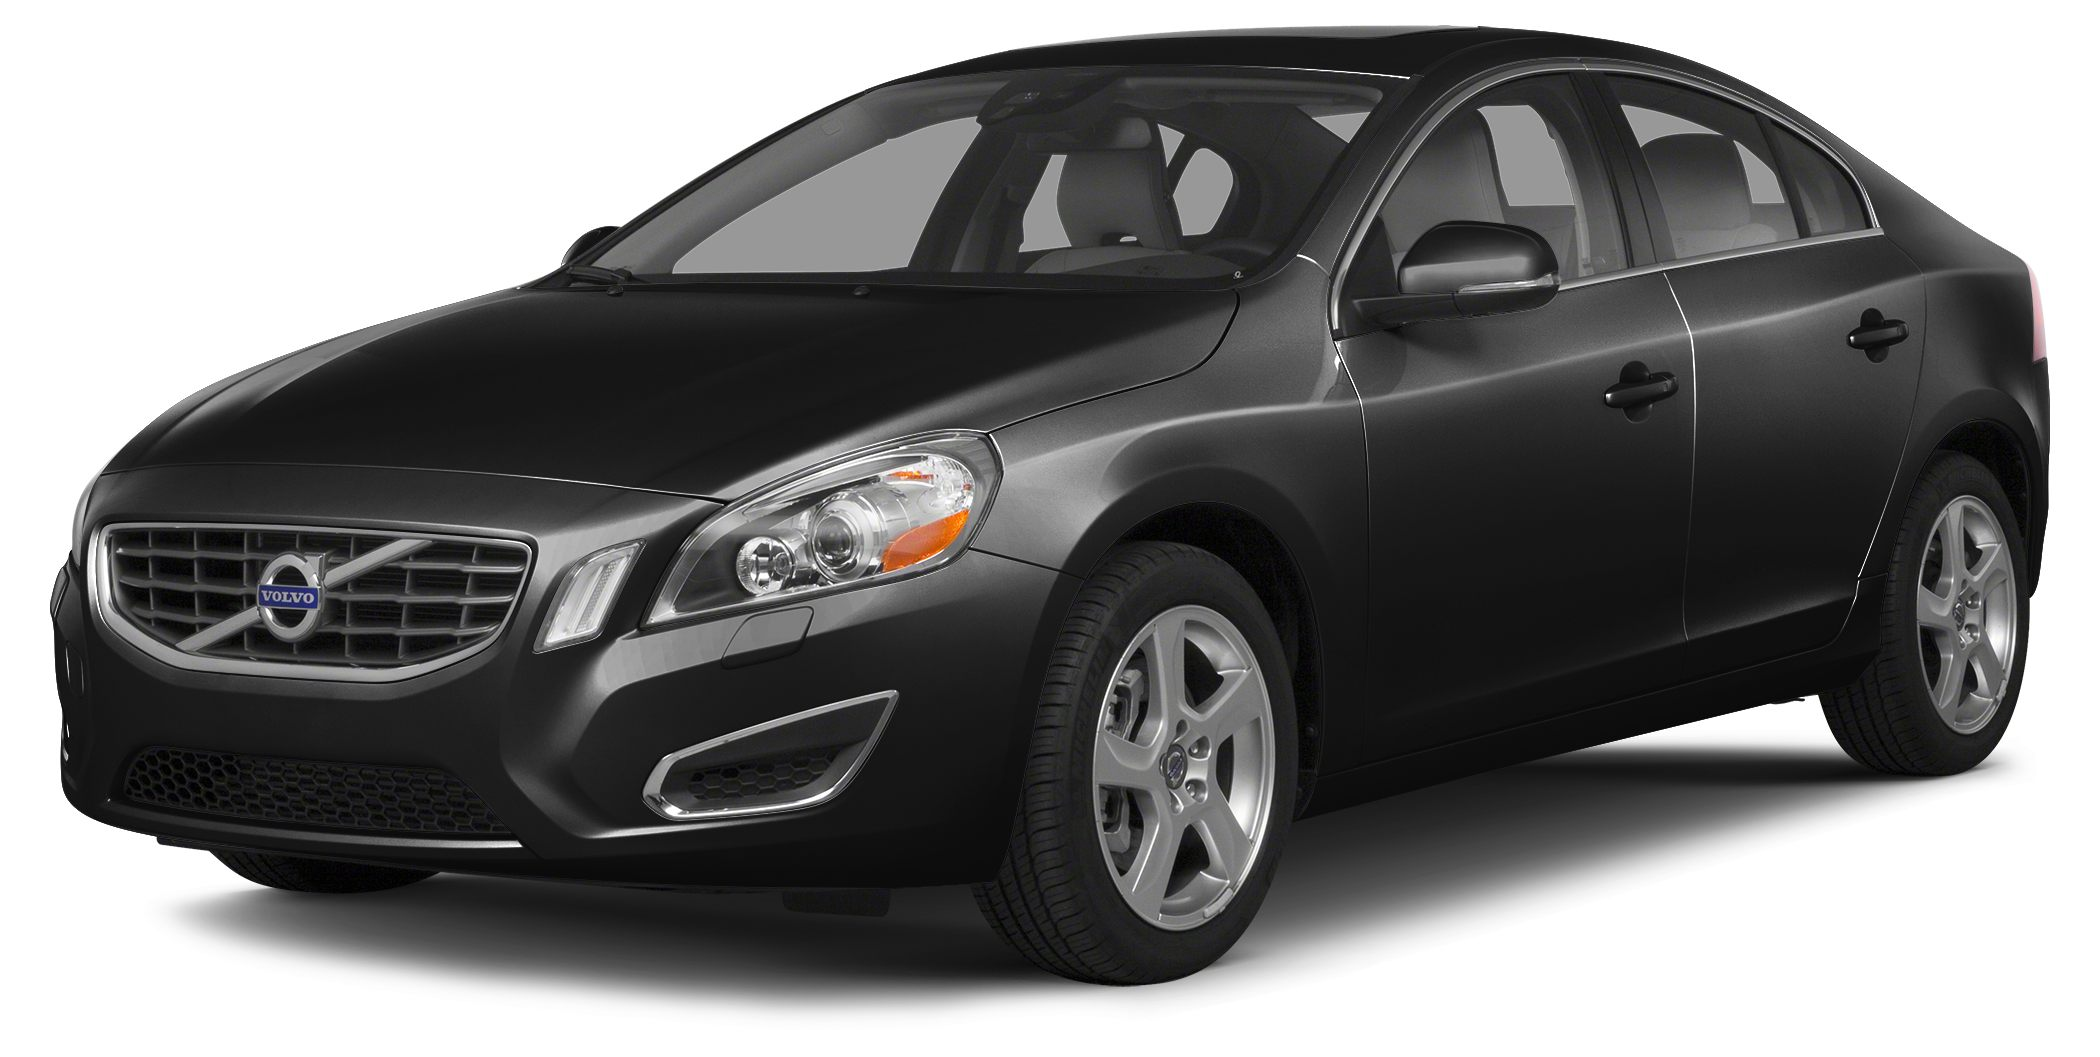 2013 Volvo S60 T5 ALL WHEEL DRIVE BLUETOOTH MP3 Player KEYLESS ENTRY 29 MPG Highway SAT RADIO